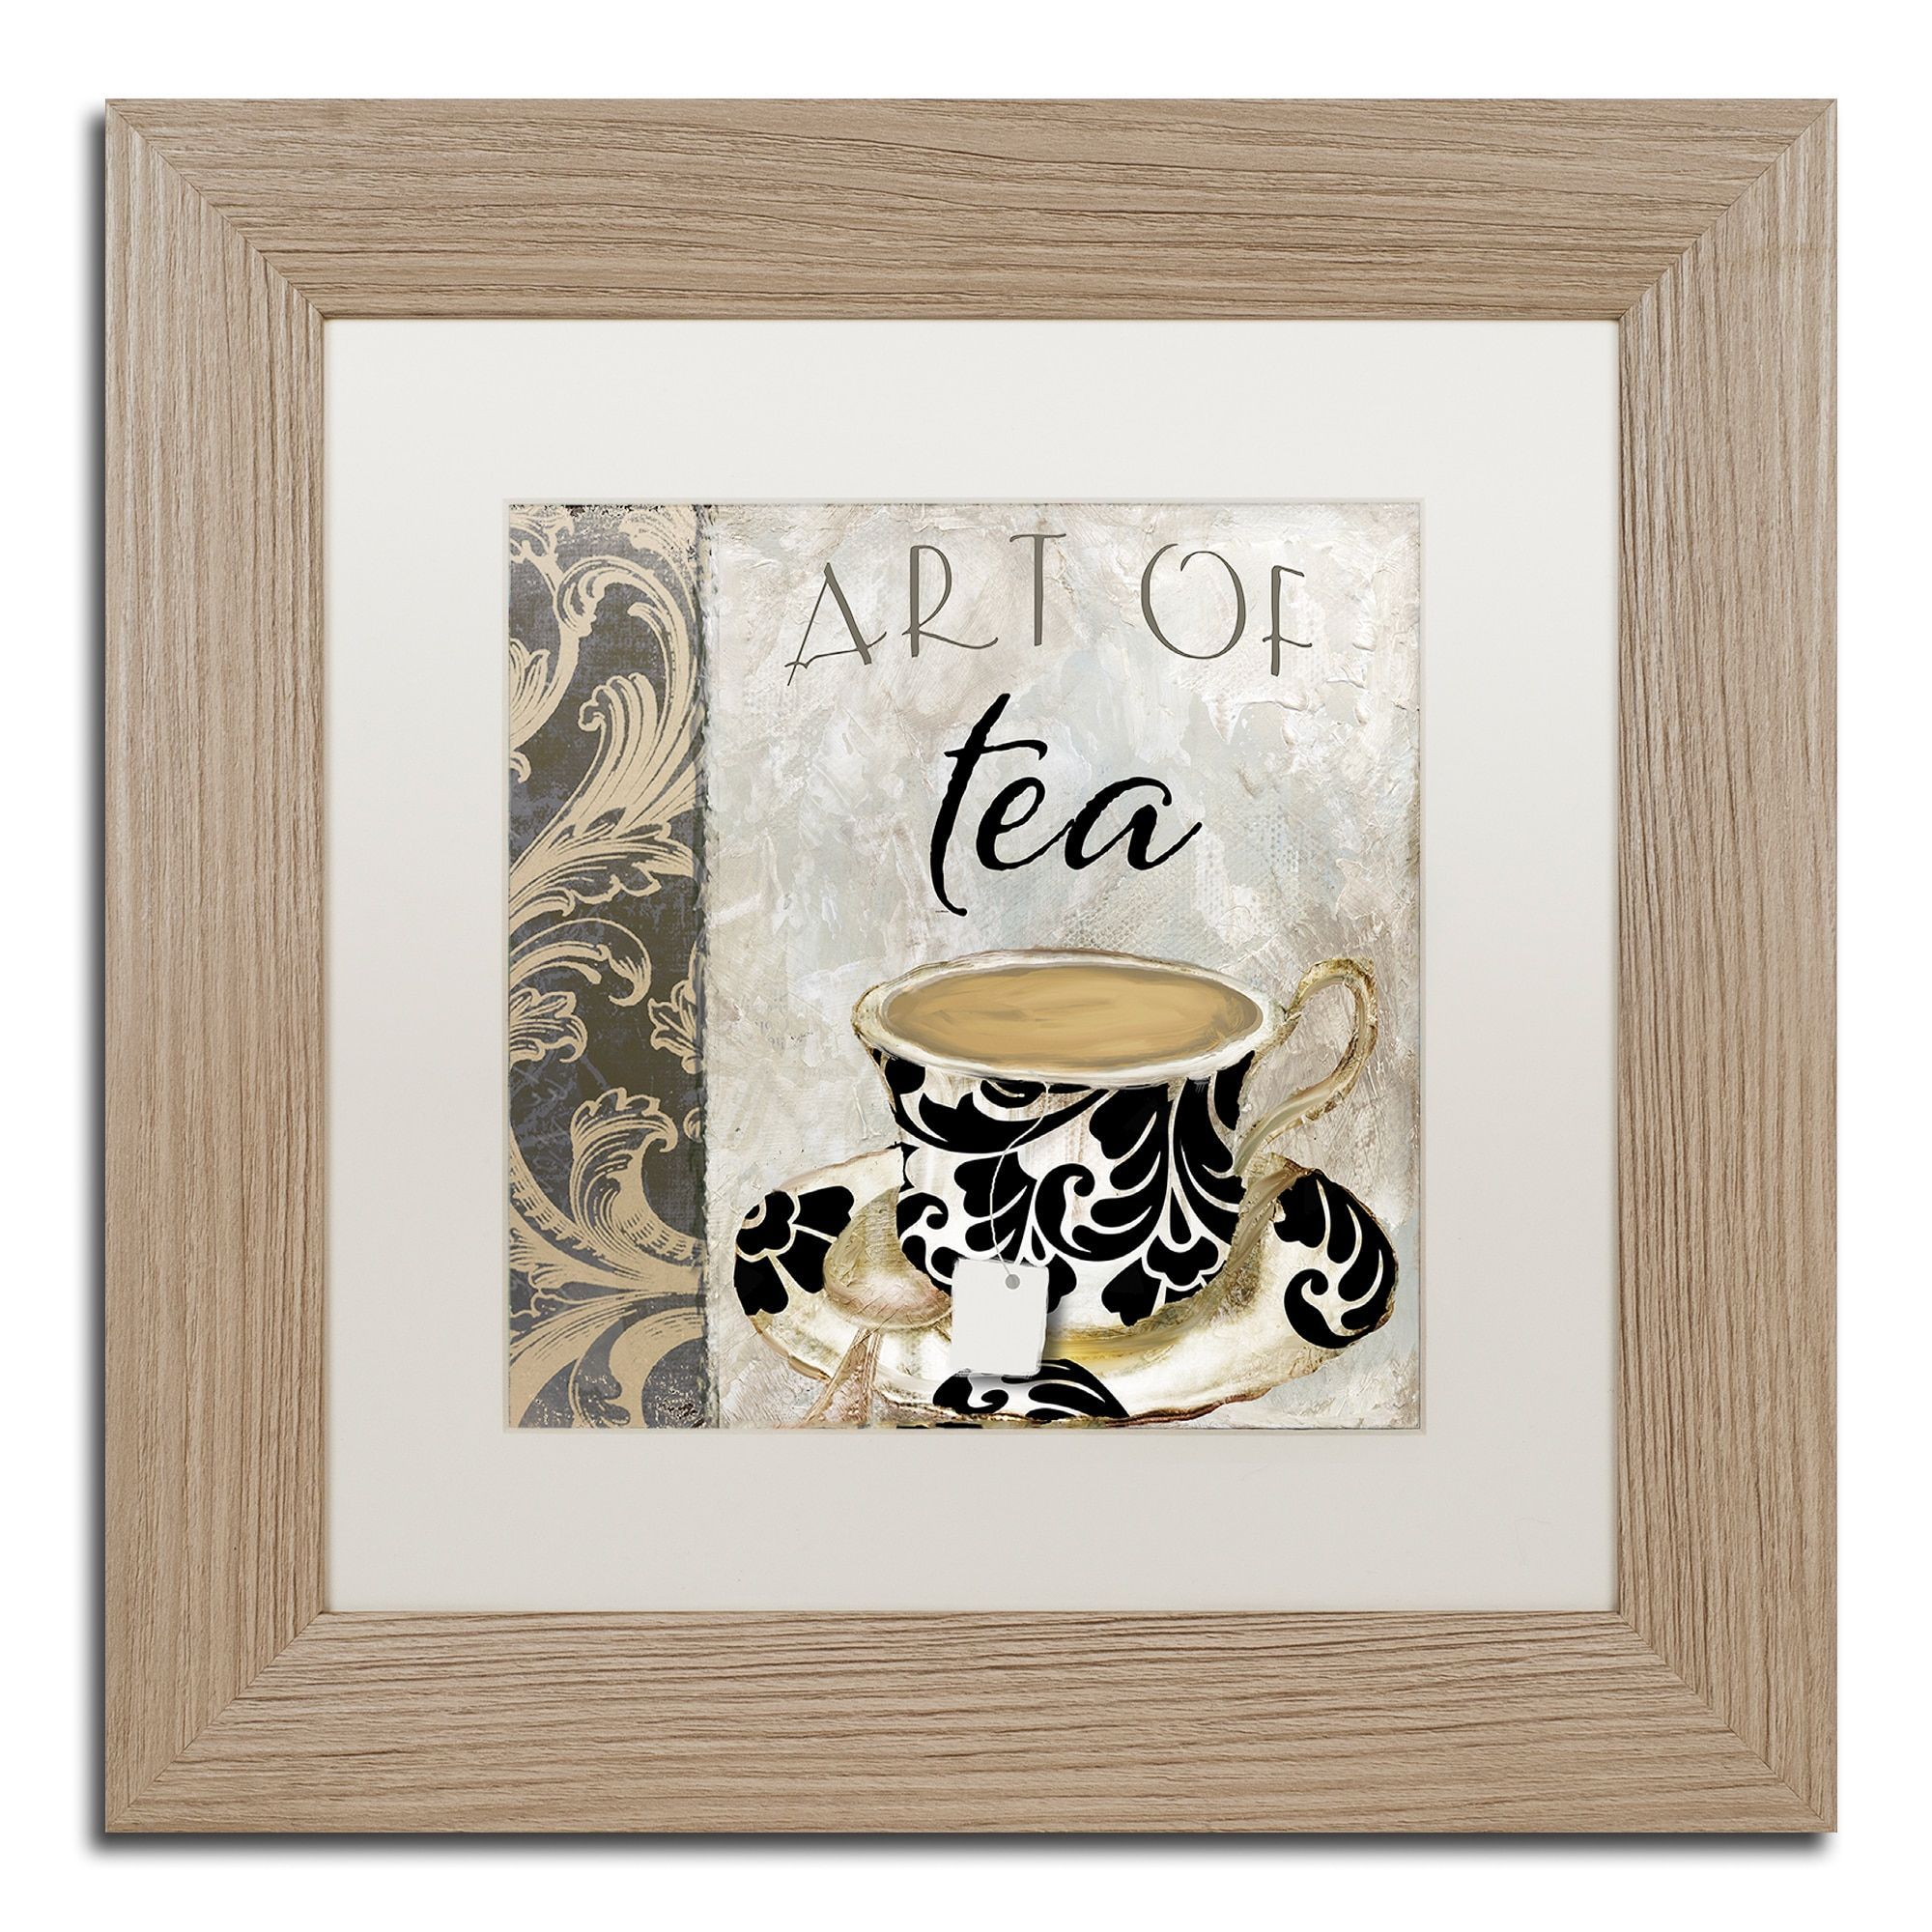 Color bakery uart of tea iu matted framed art products pinterest